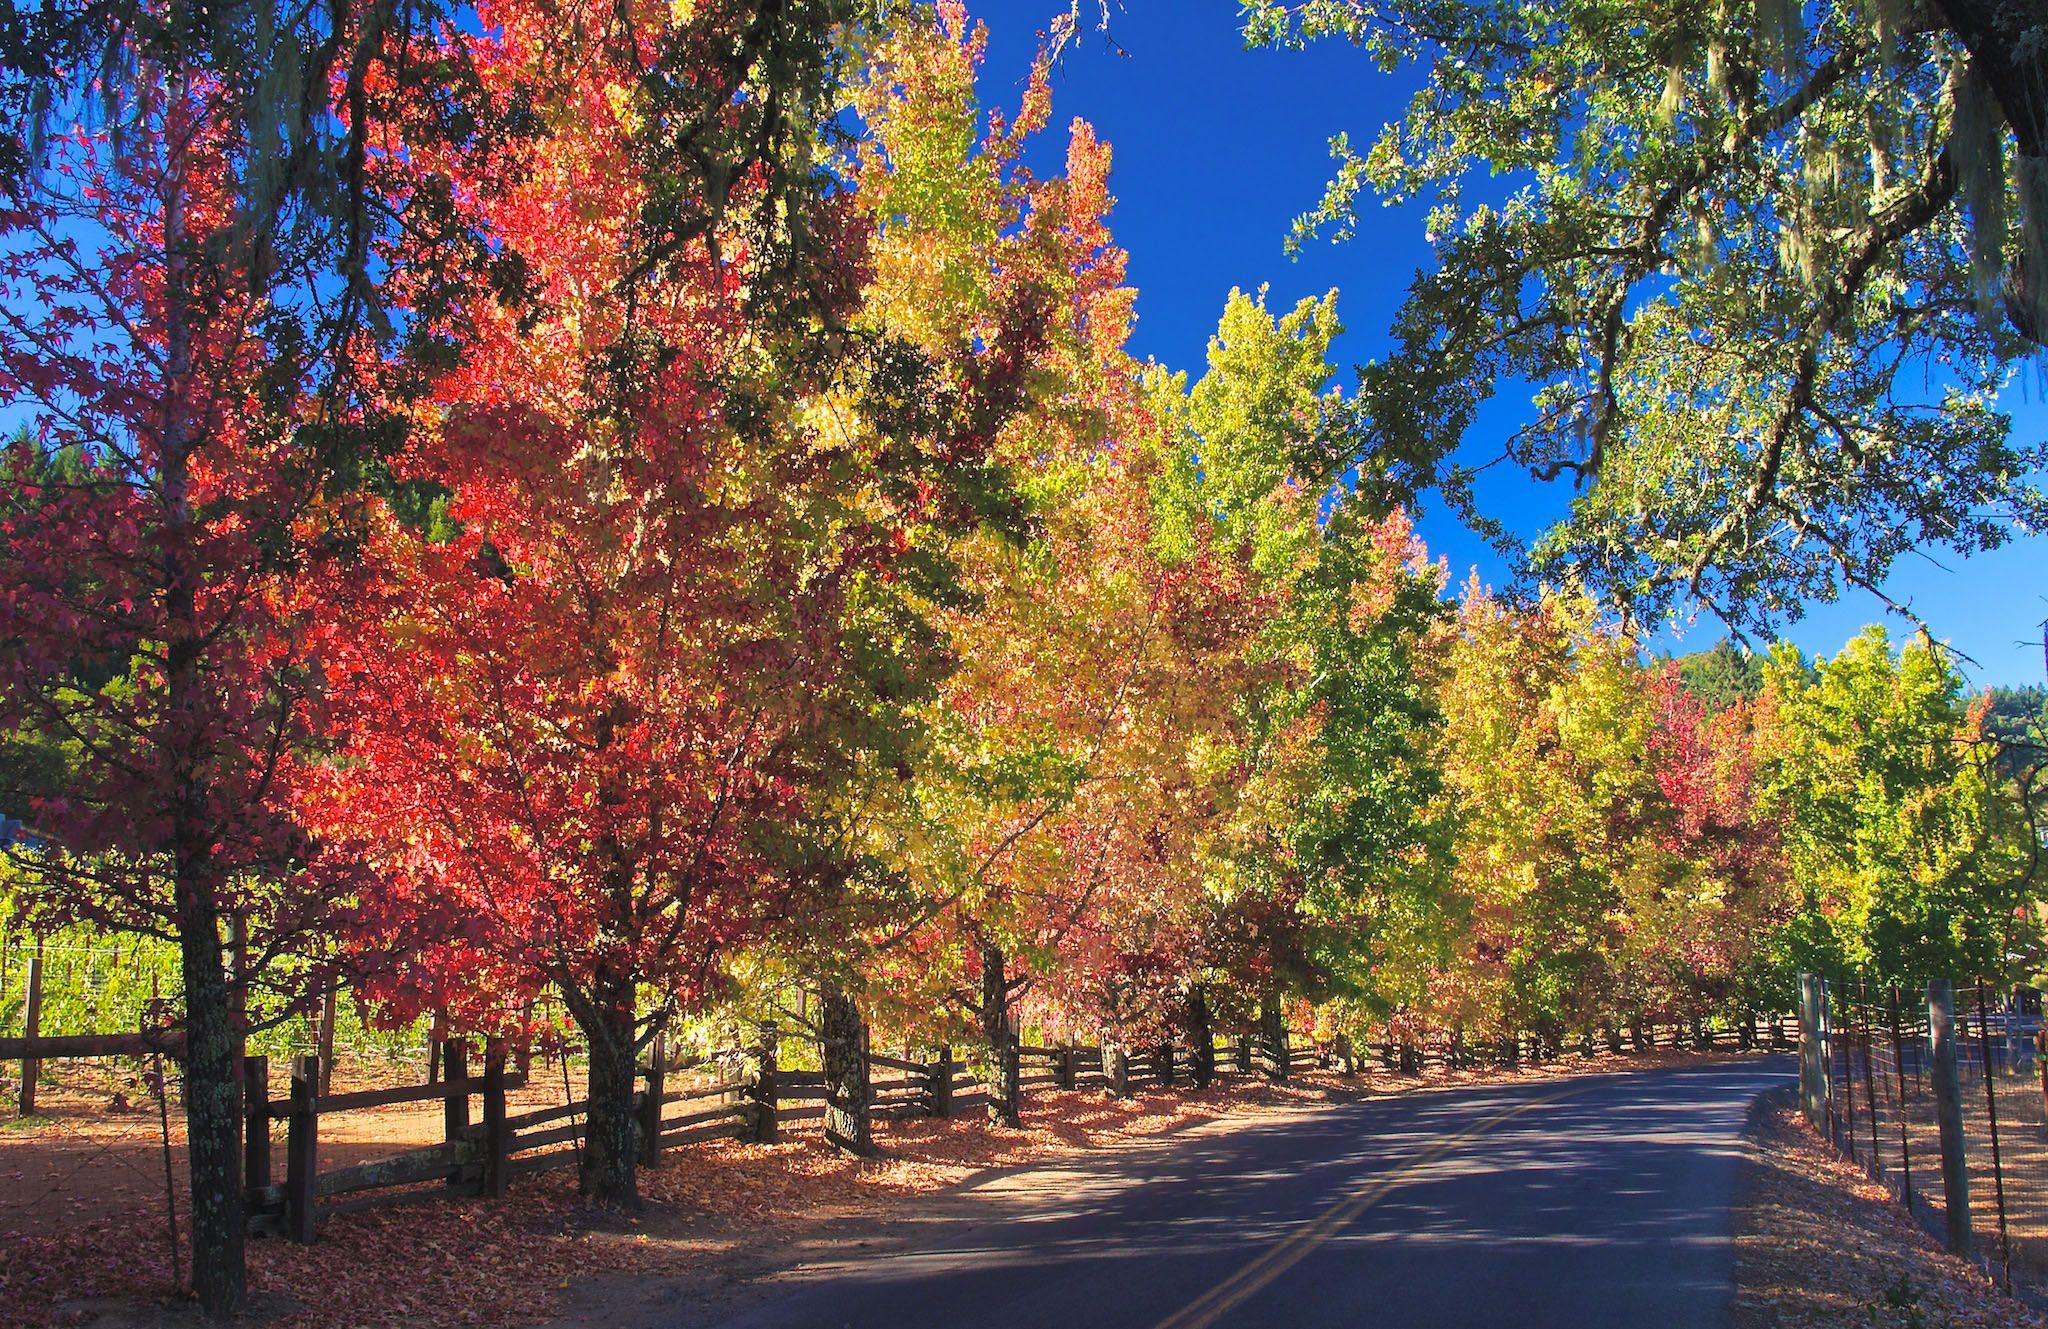 Sonoma County Fall Color The Digital Story Sonoma County Wrightwood California Sonoma